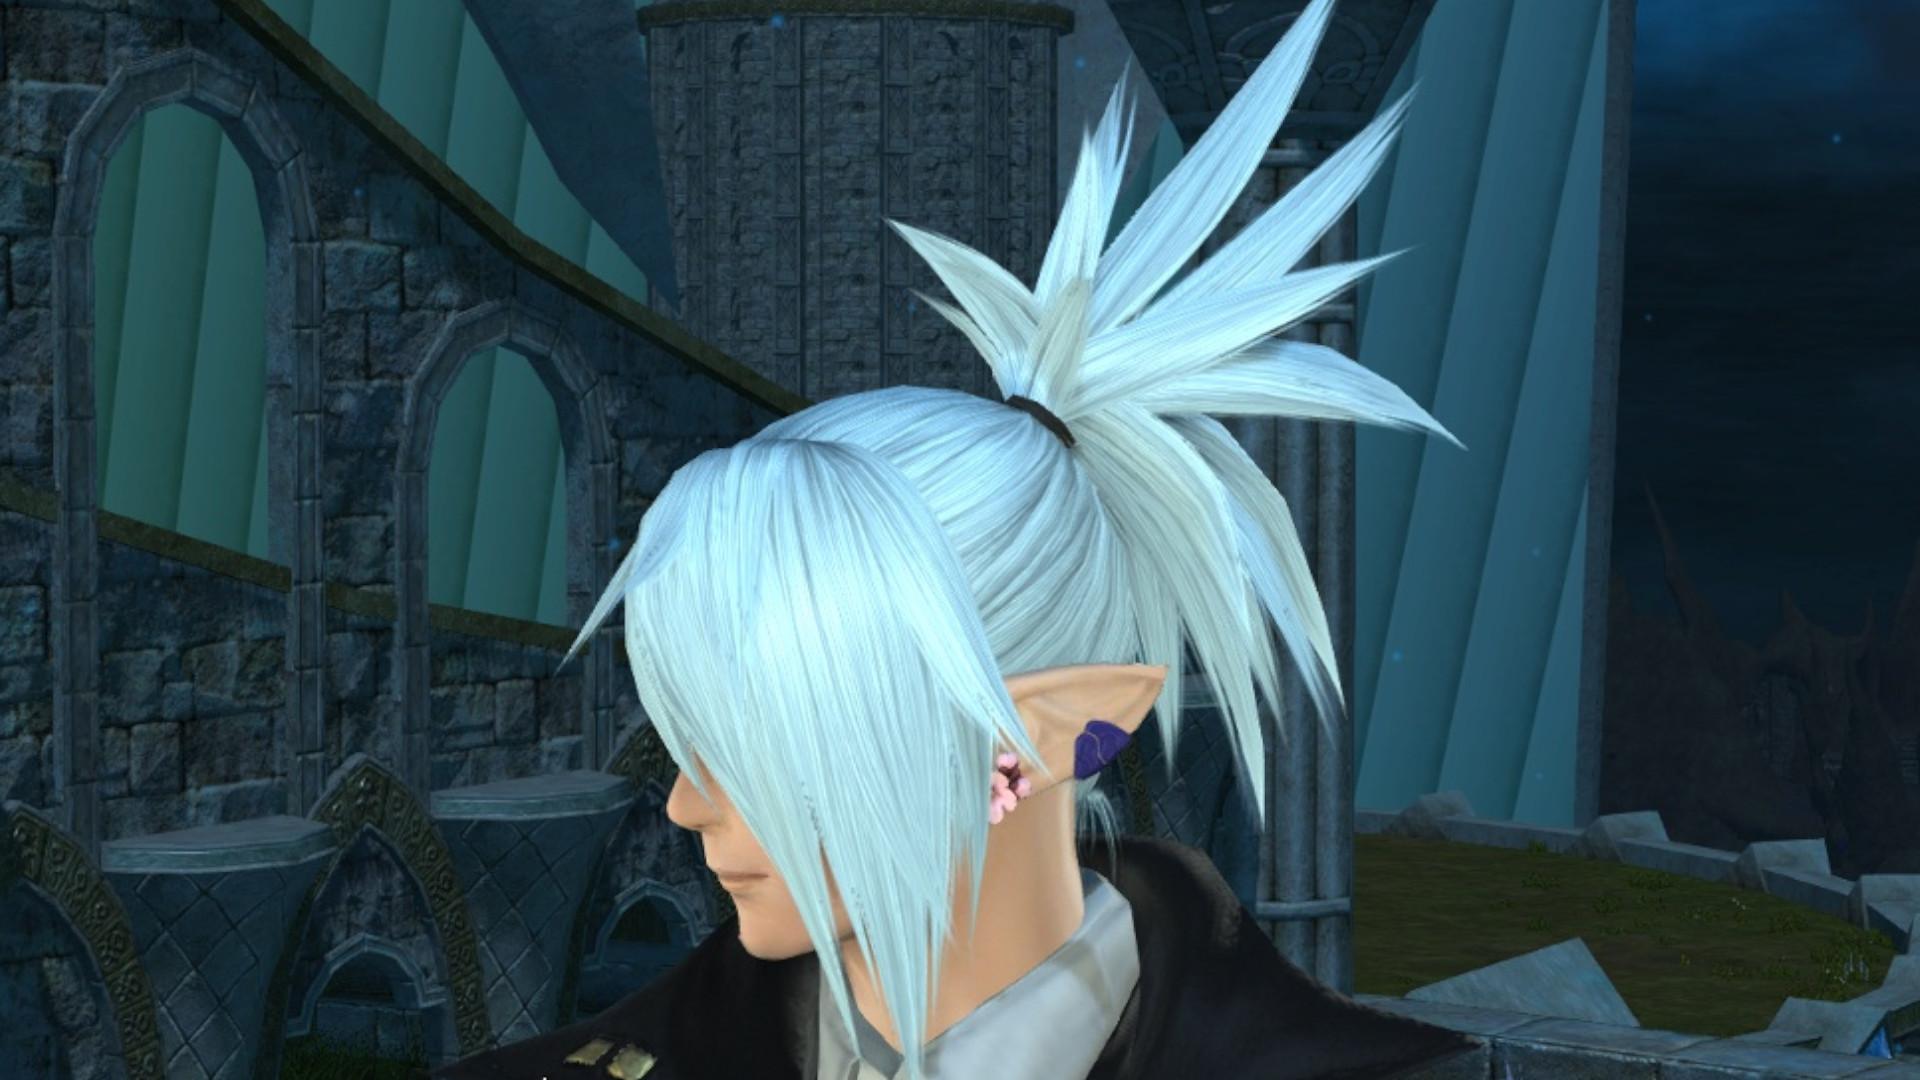 FFXIV devs bring back old hairstyle, internet explodes